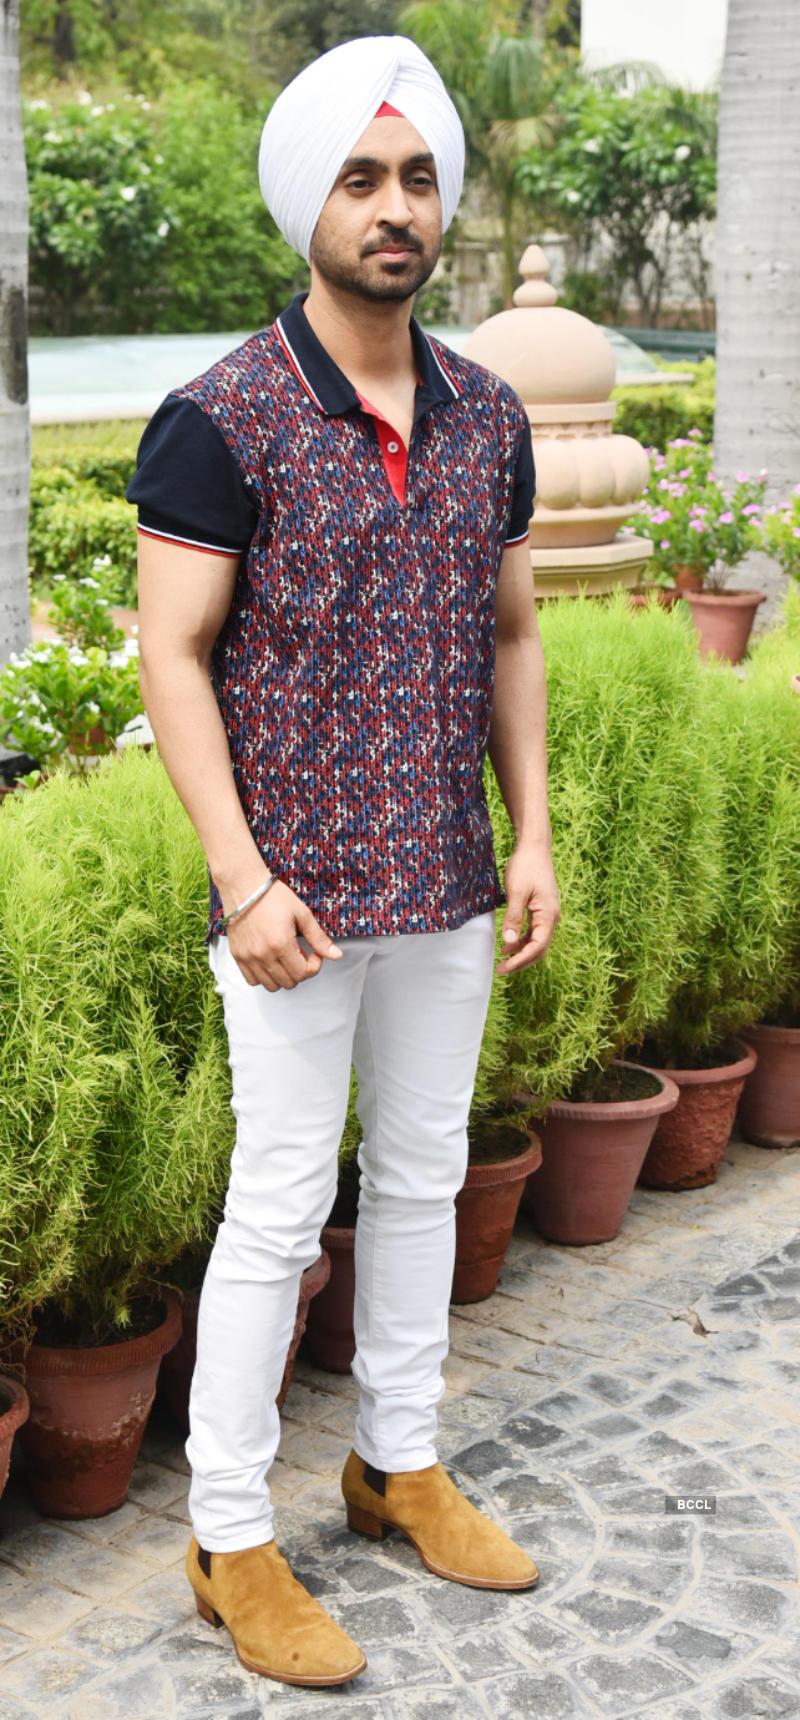 Arjun Patiala: Promotions